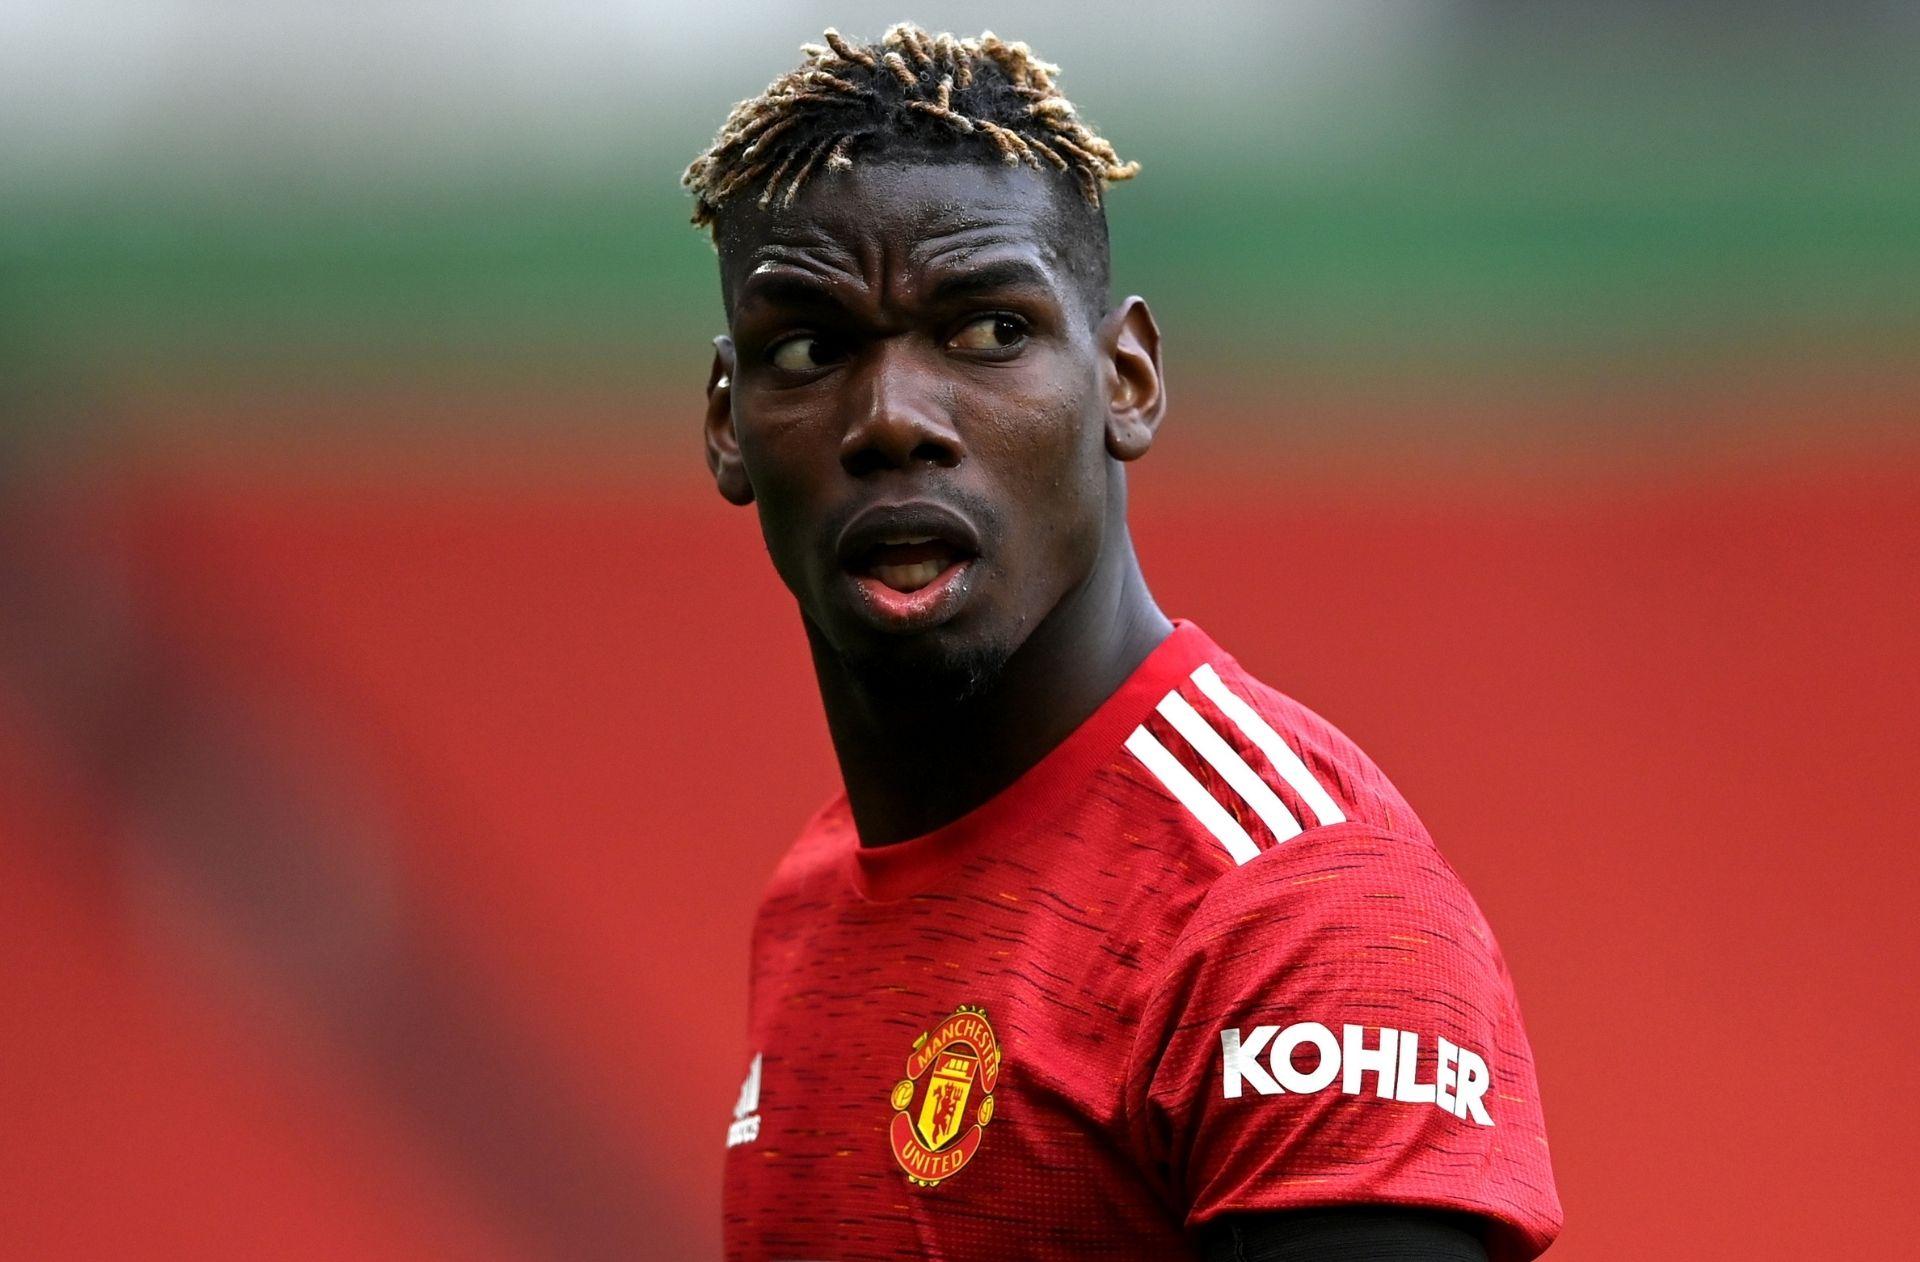 Paul Pogba - Man United